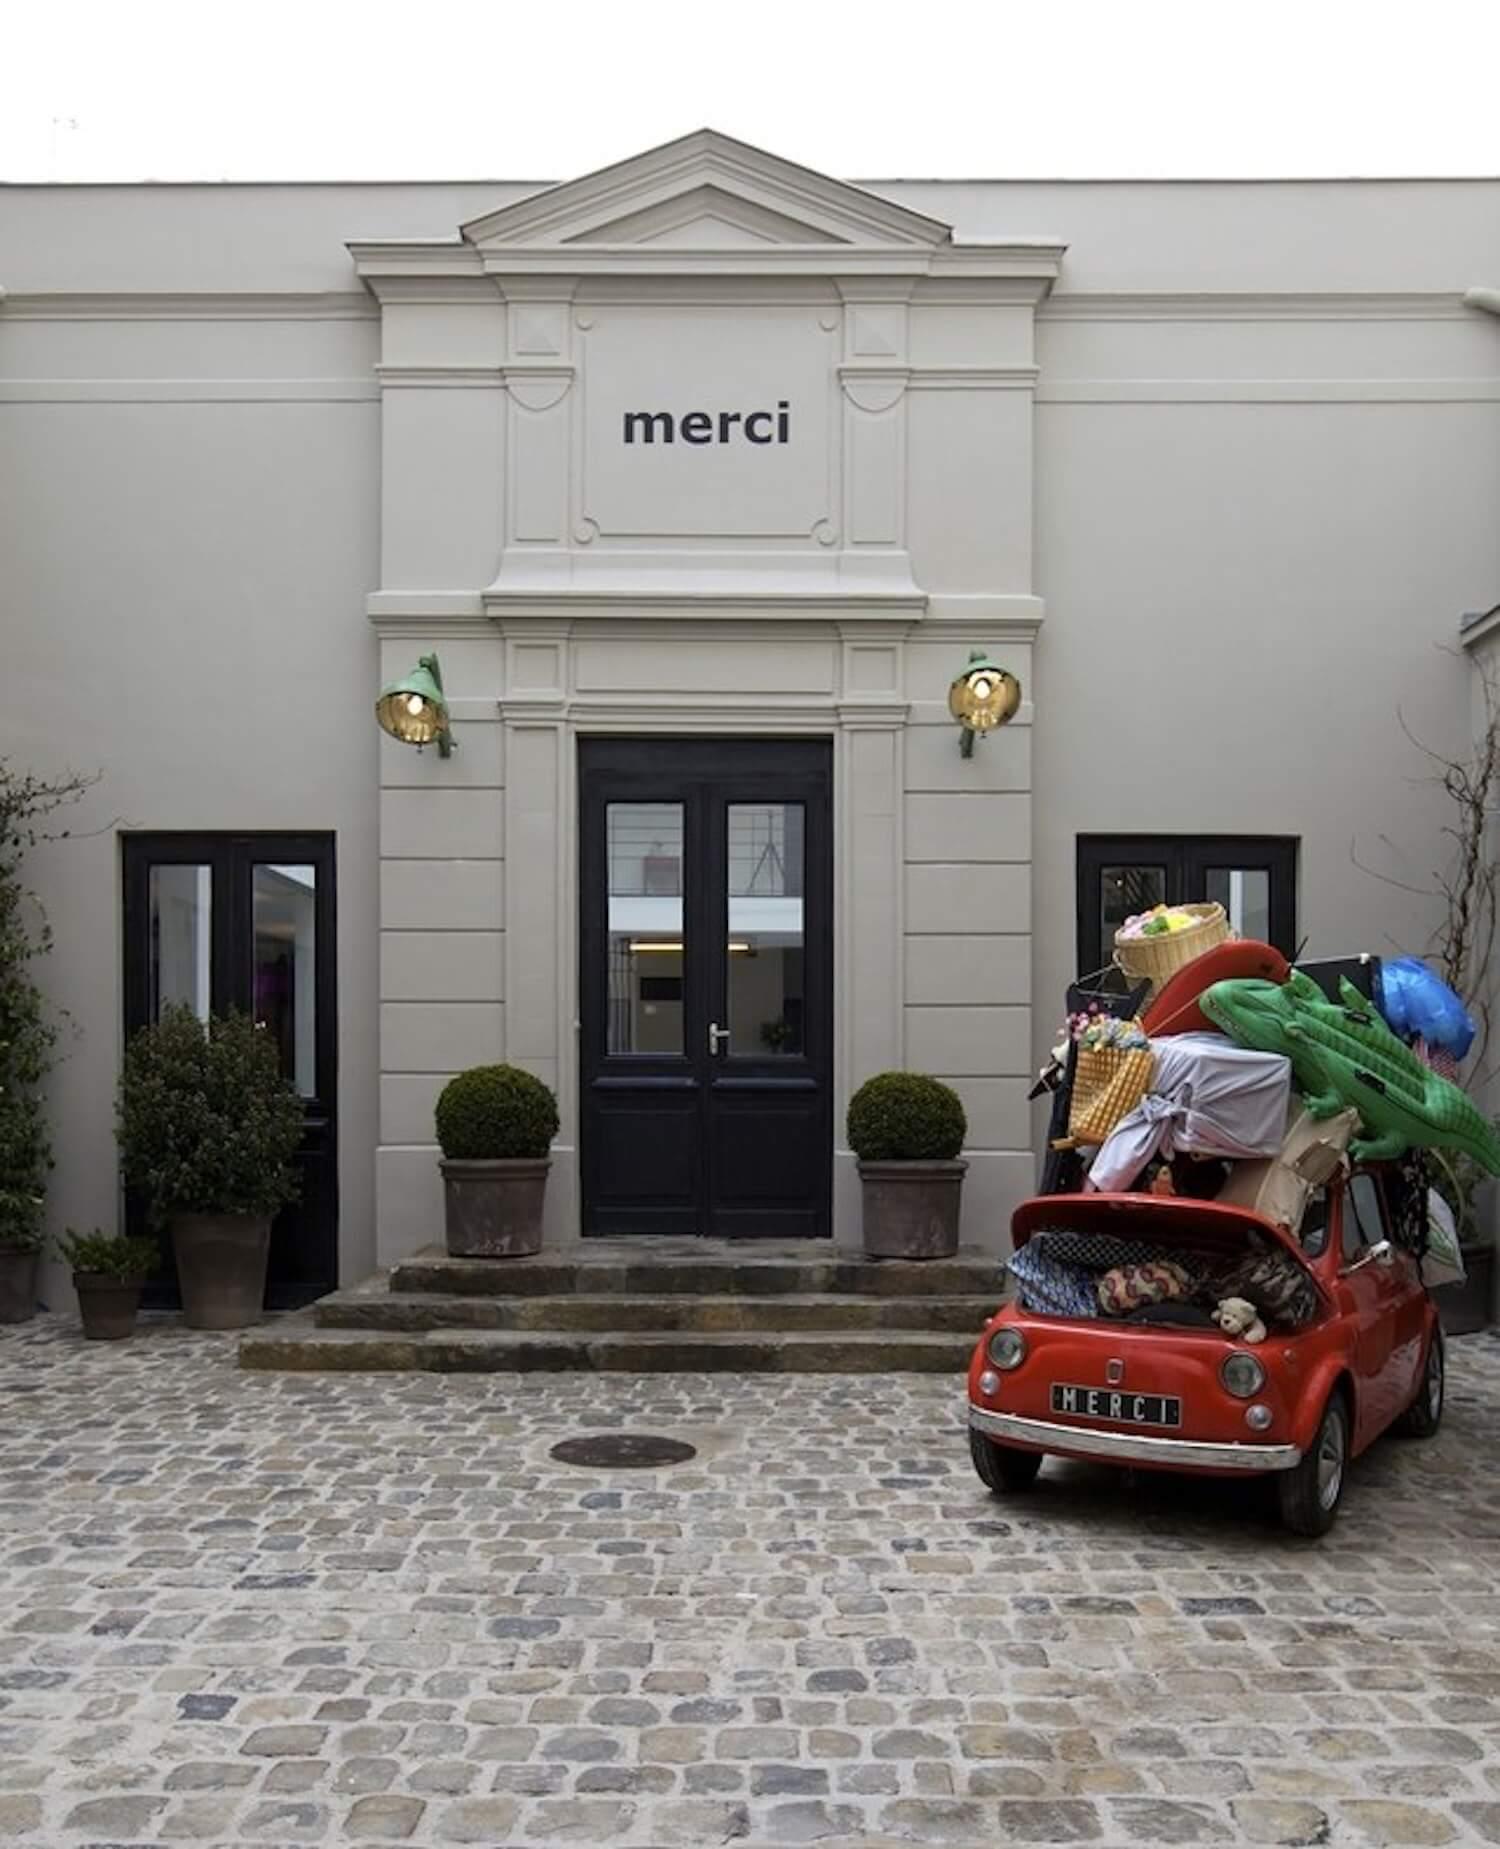 est living paris travel guide shopping merci